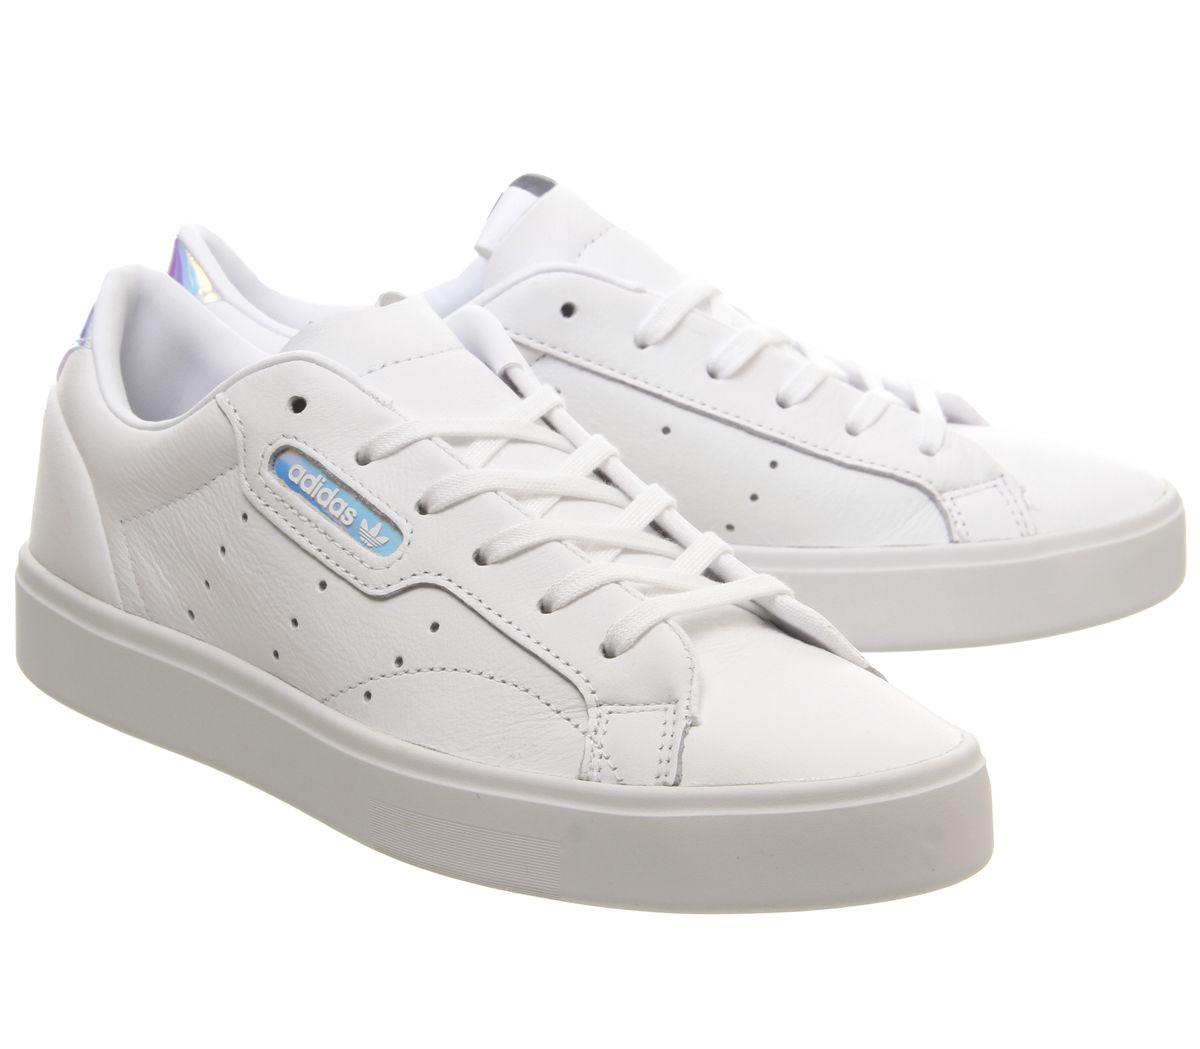 Short-femme-Adidas-sleek-Baskets-Blanc-irise-Exclusive-Trainers-Shoes miniature 7